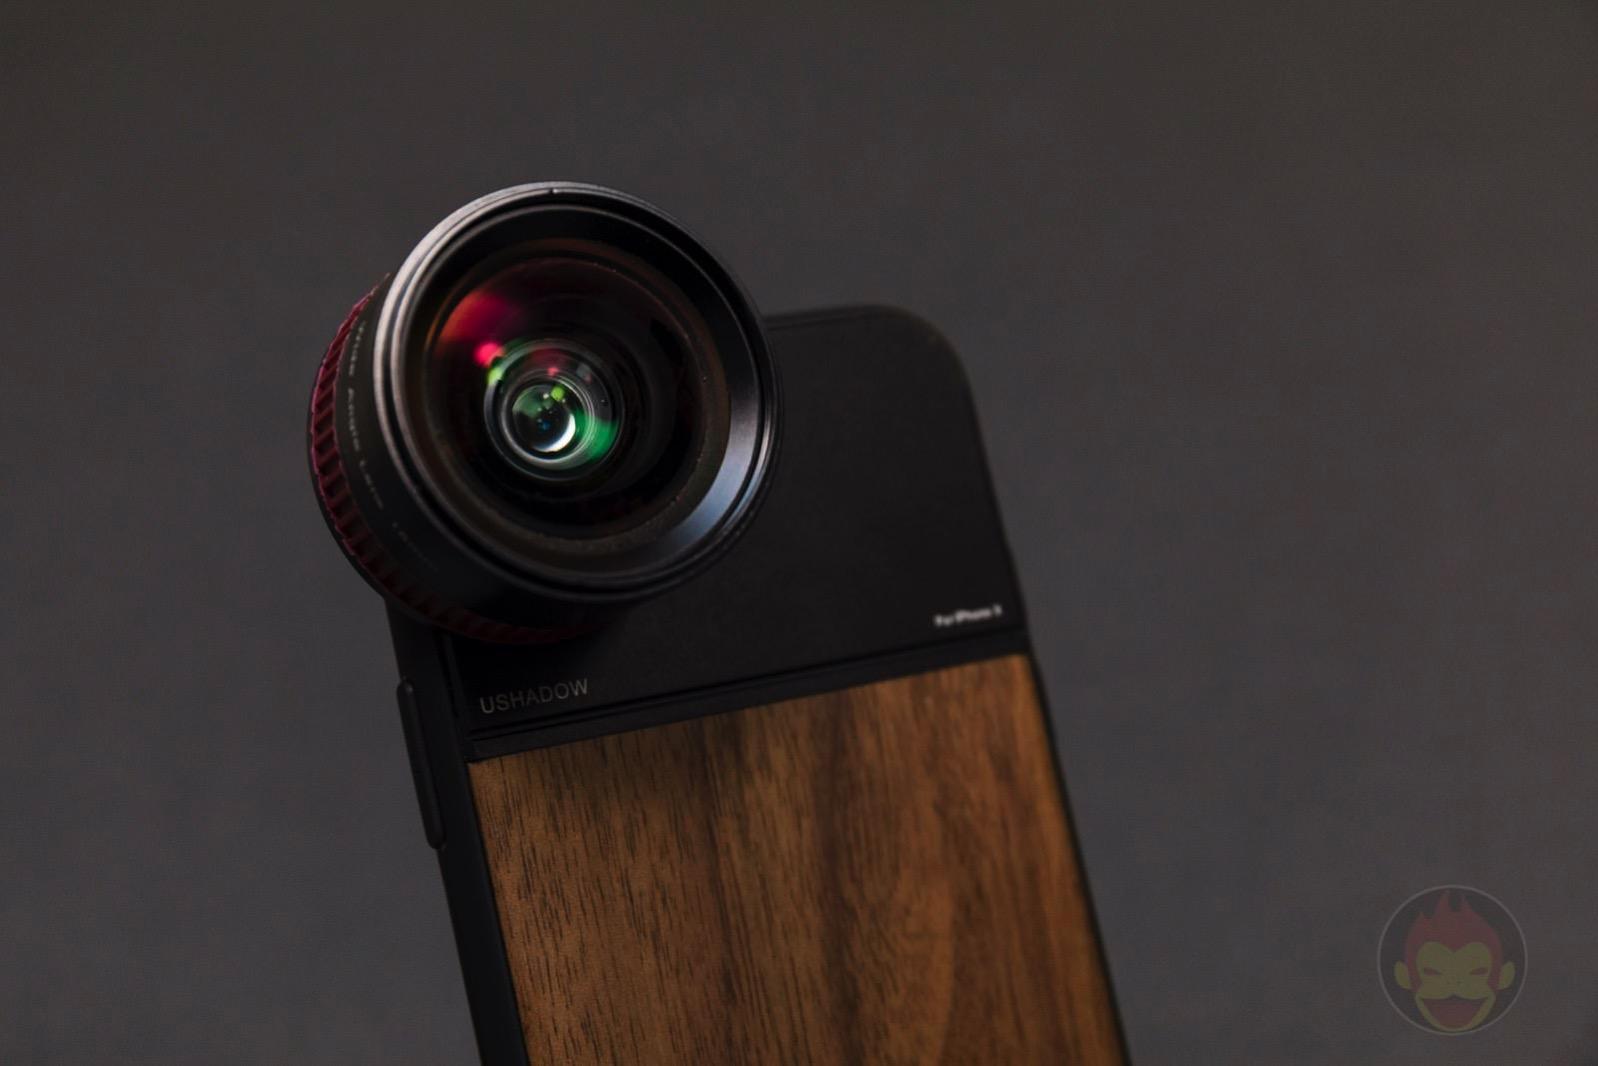 USHADOW-X1-Lens-System-Review-10.jpg